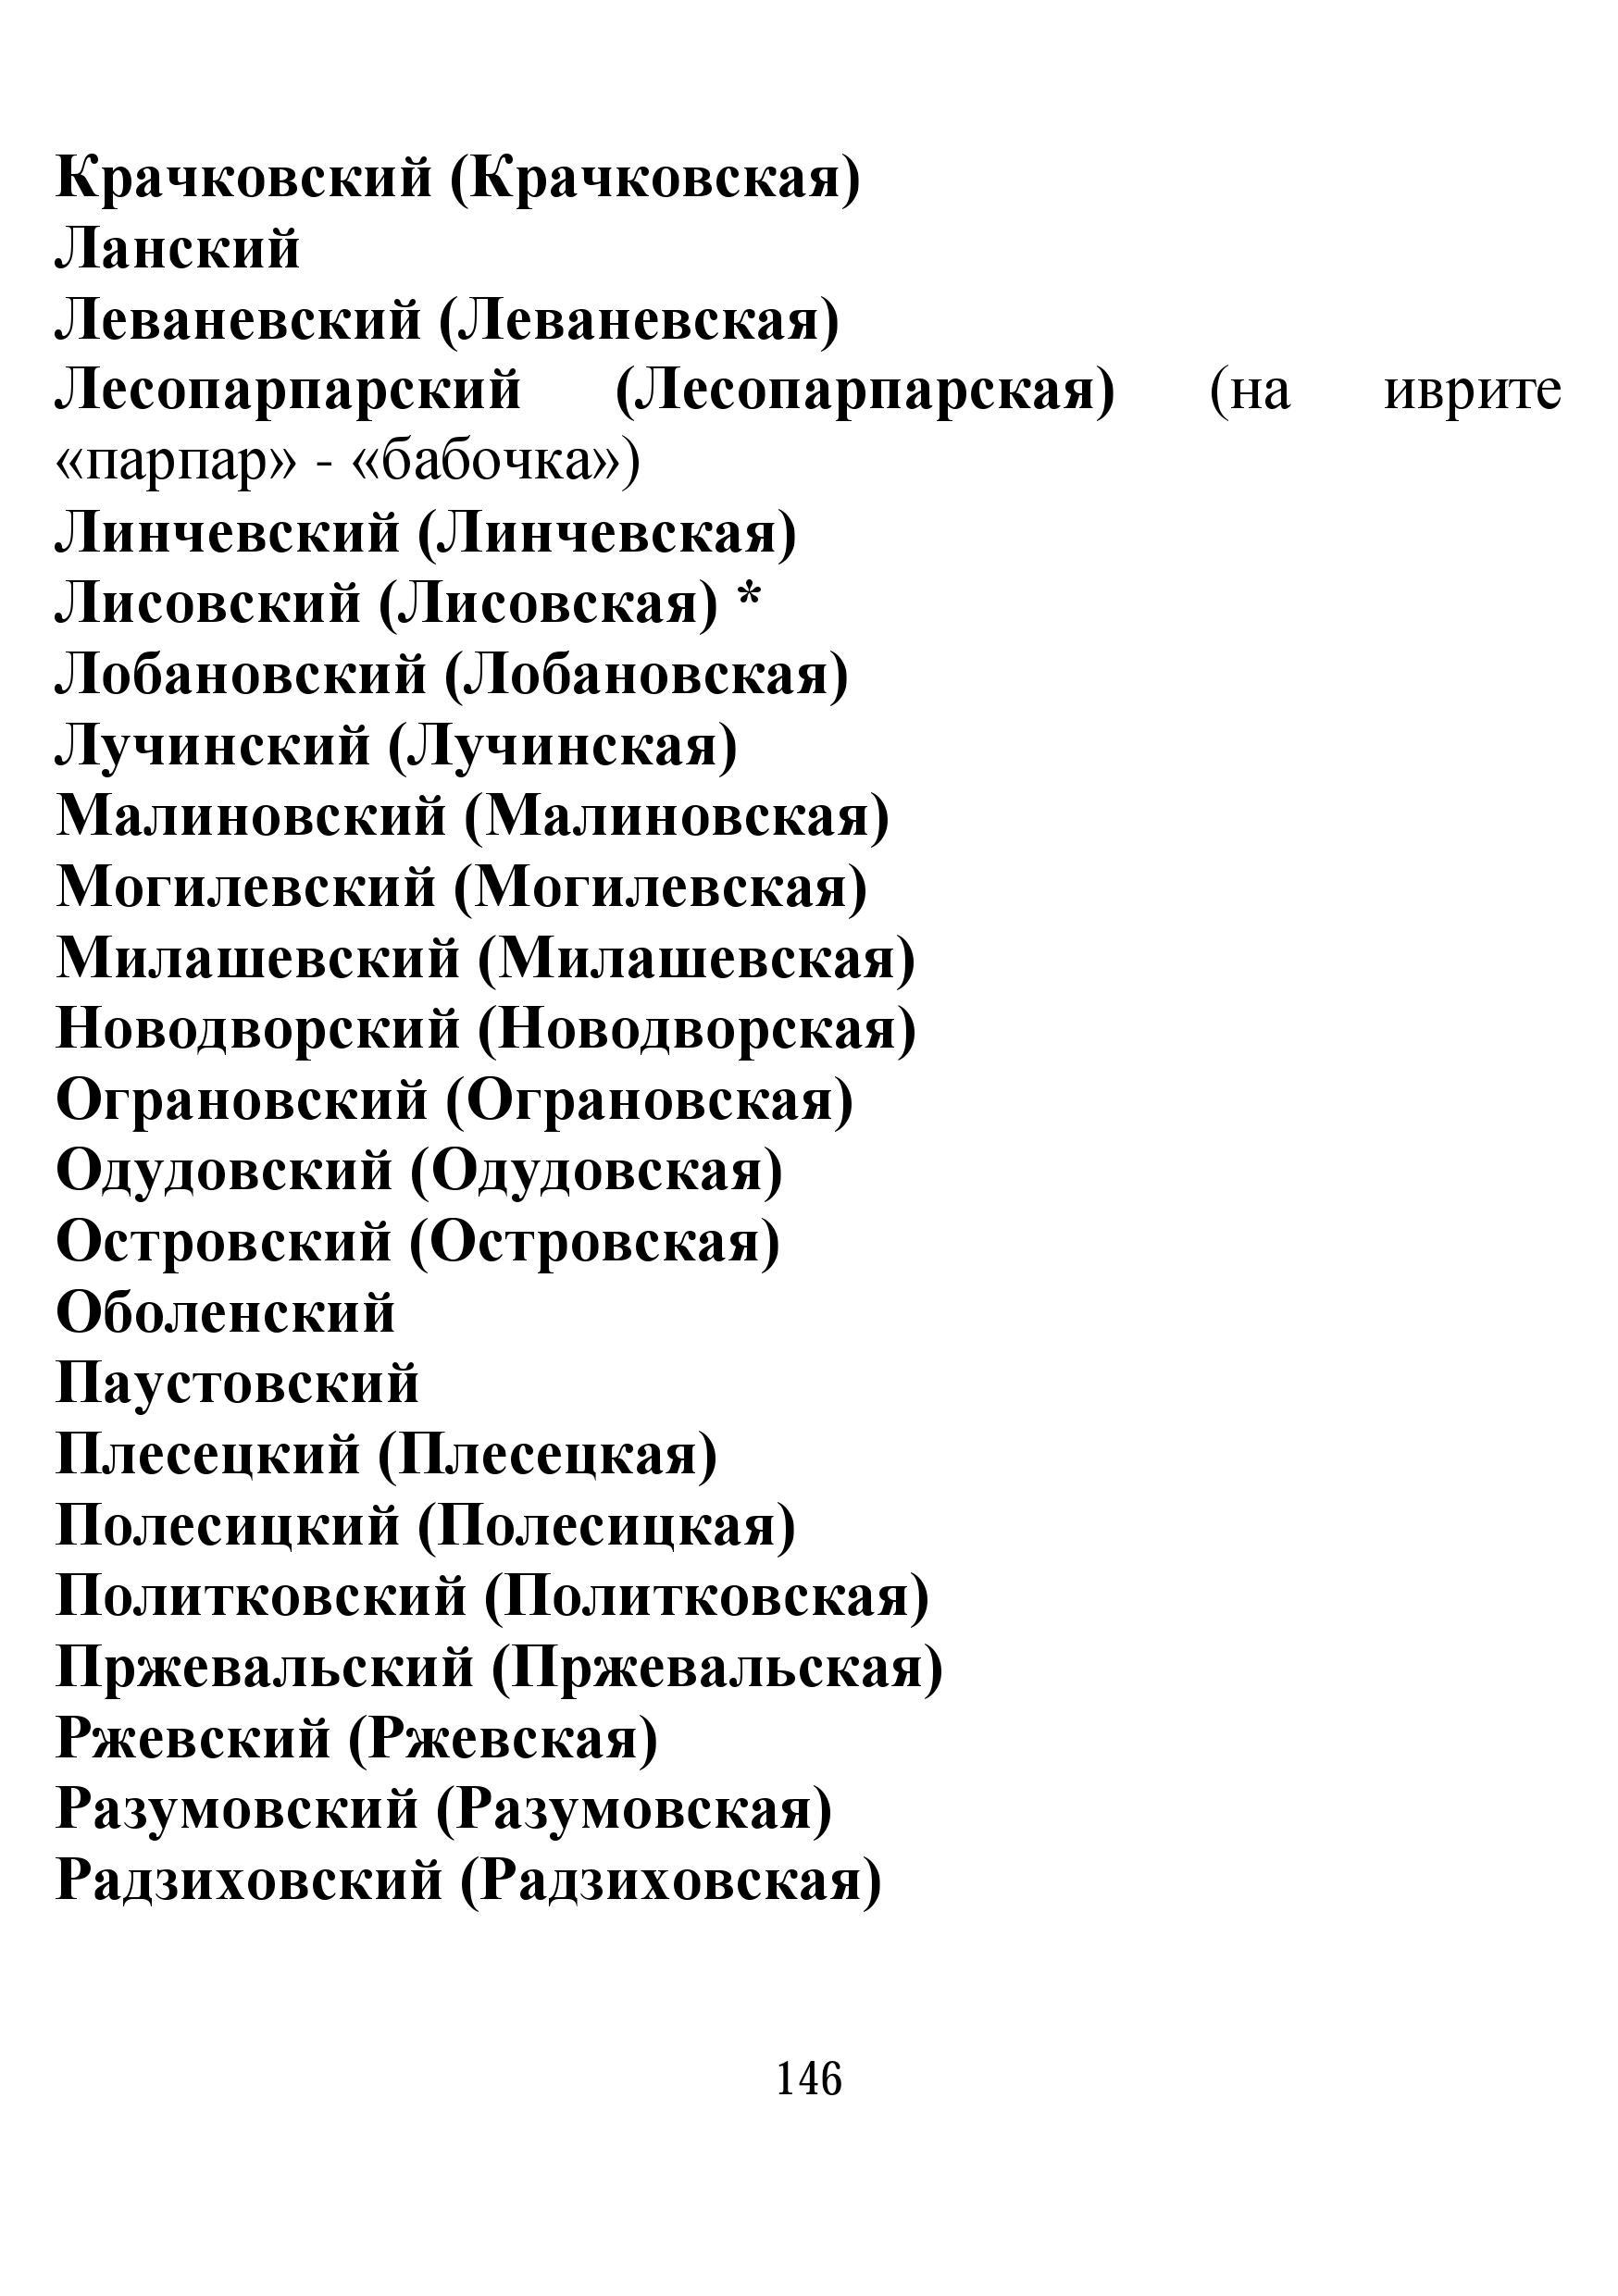 http://s4.uploads.ru/RAjPy.jpg